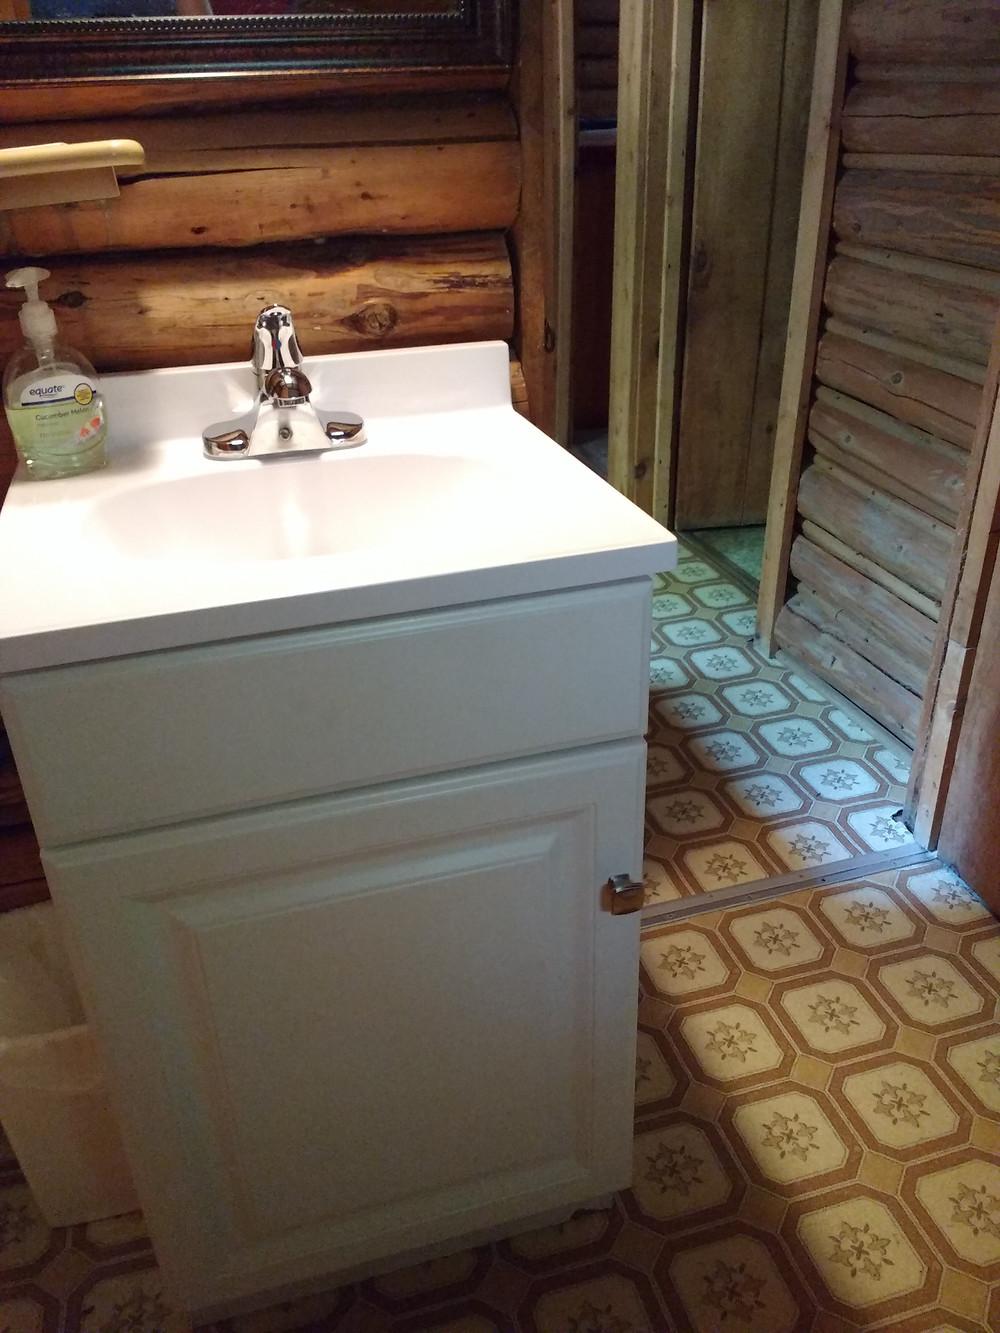 #2 new sink